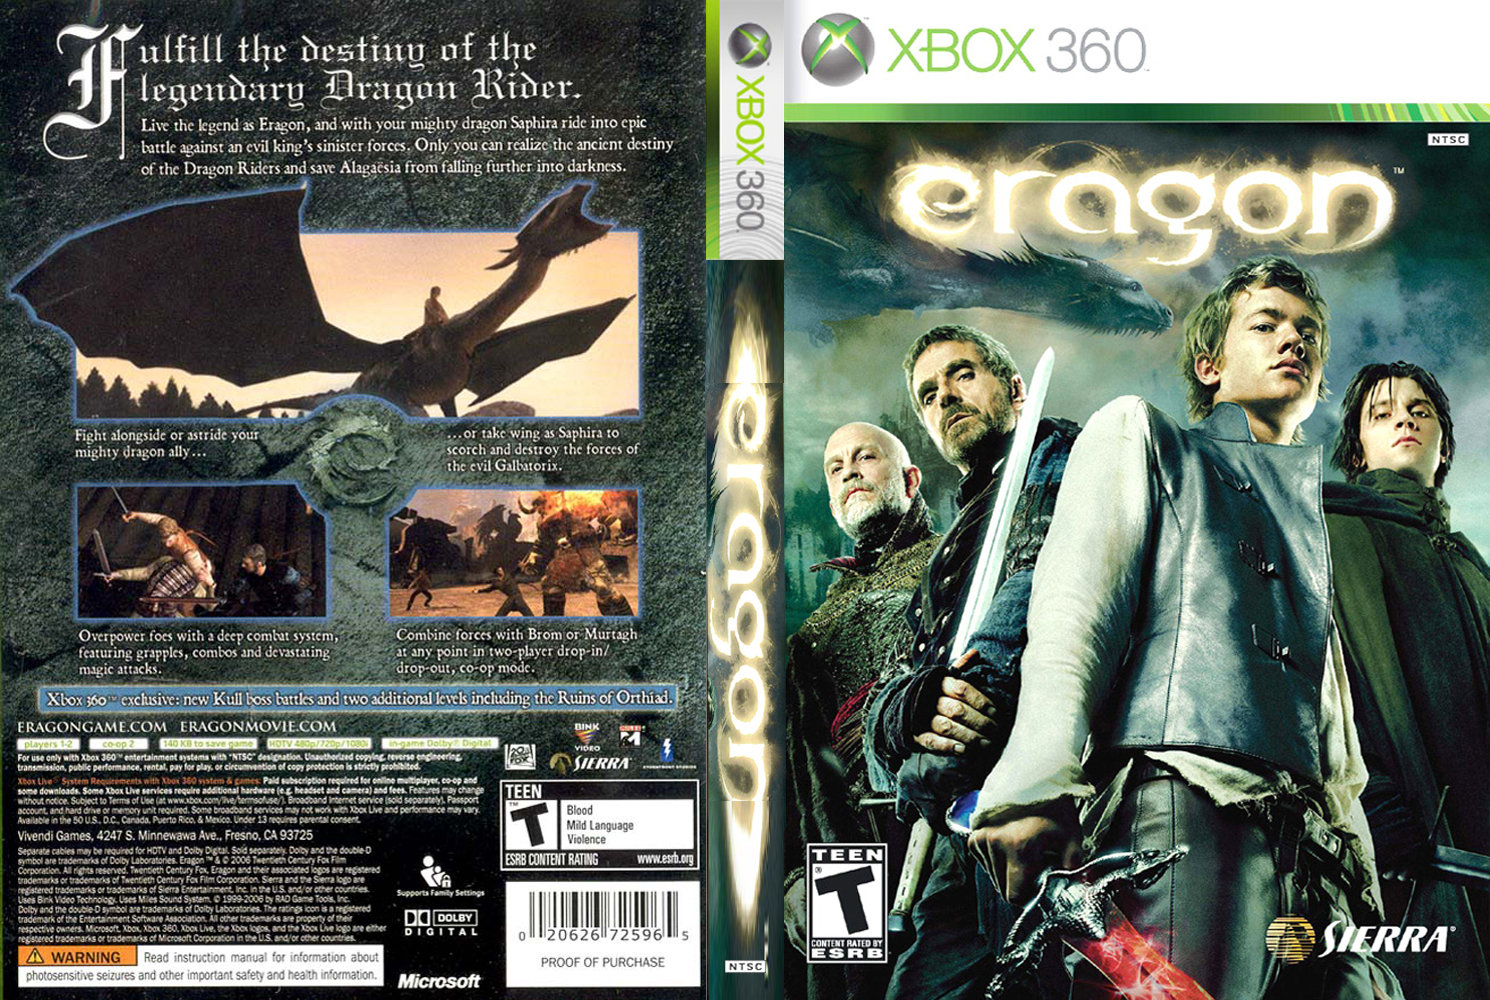 Eragon review / preview for xbox (xb).